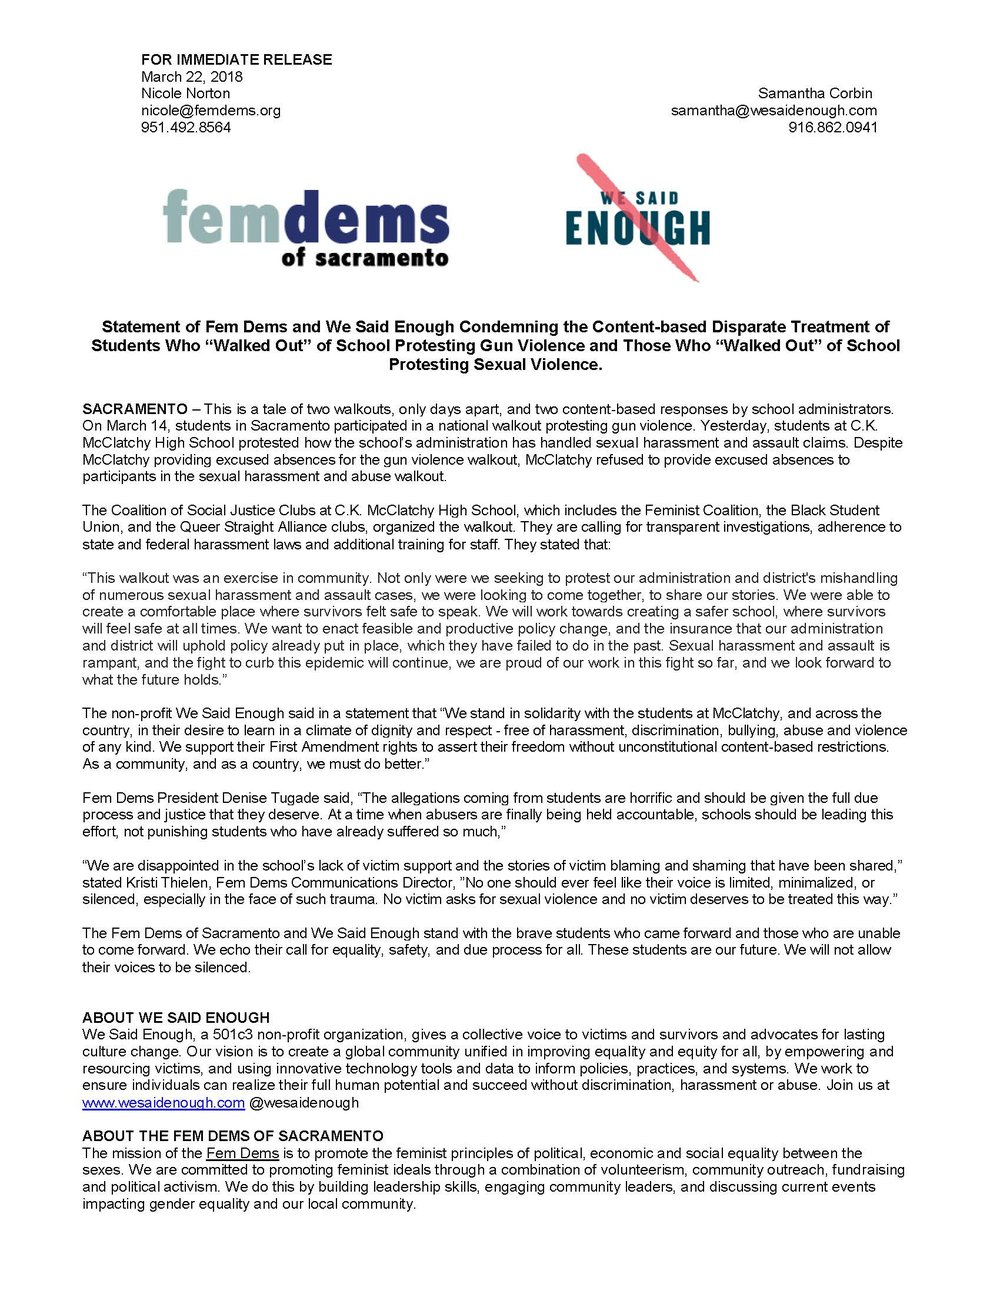 Fem Dems CKM Protest Media Advisory_3.22.18.jpg